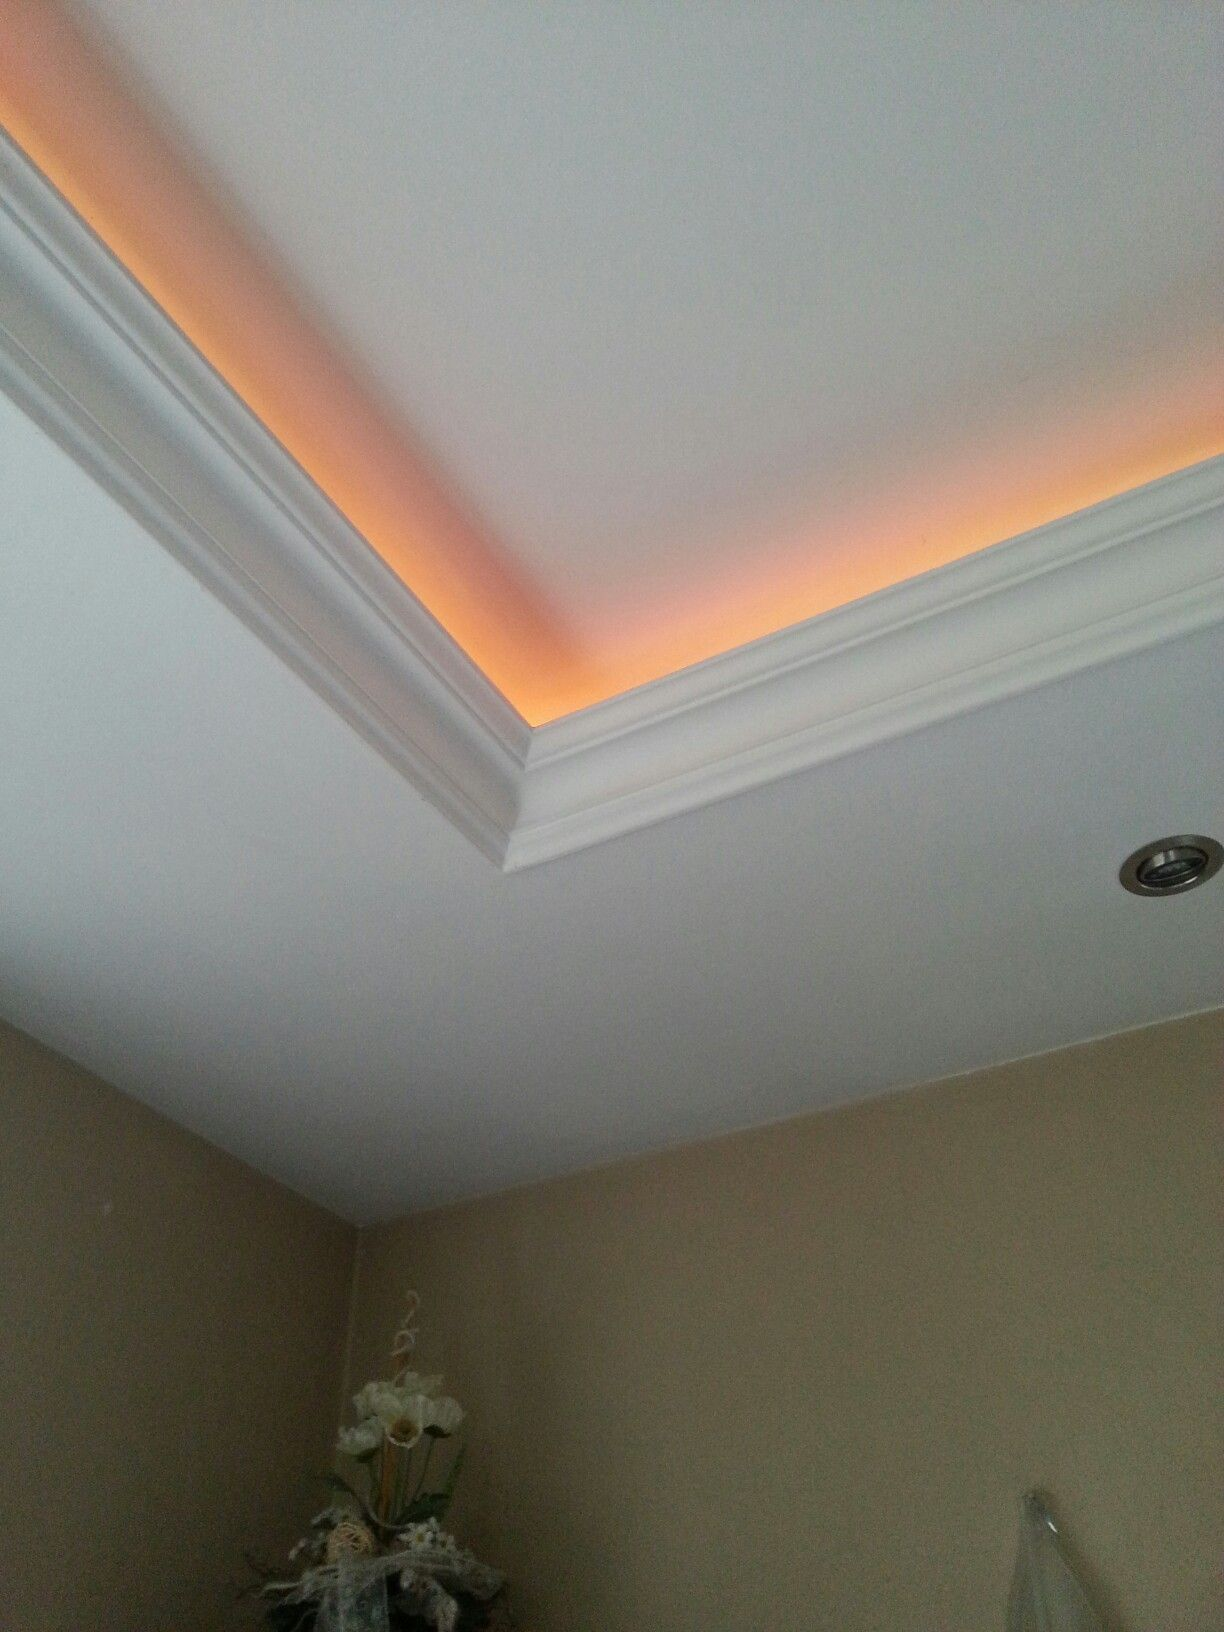 Indirekte Beleuchtung Im Wohnzimmer Schlafzimmer Flure Oder Kinderzimmer Stuck Am Rand Ruang Tamu Rumah Interior Rumah